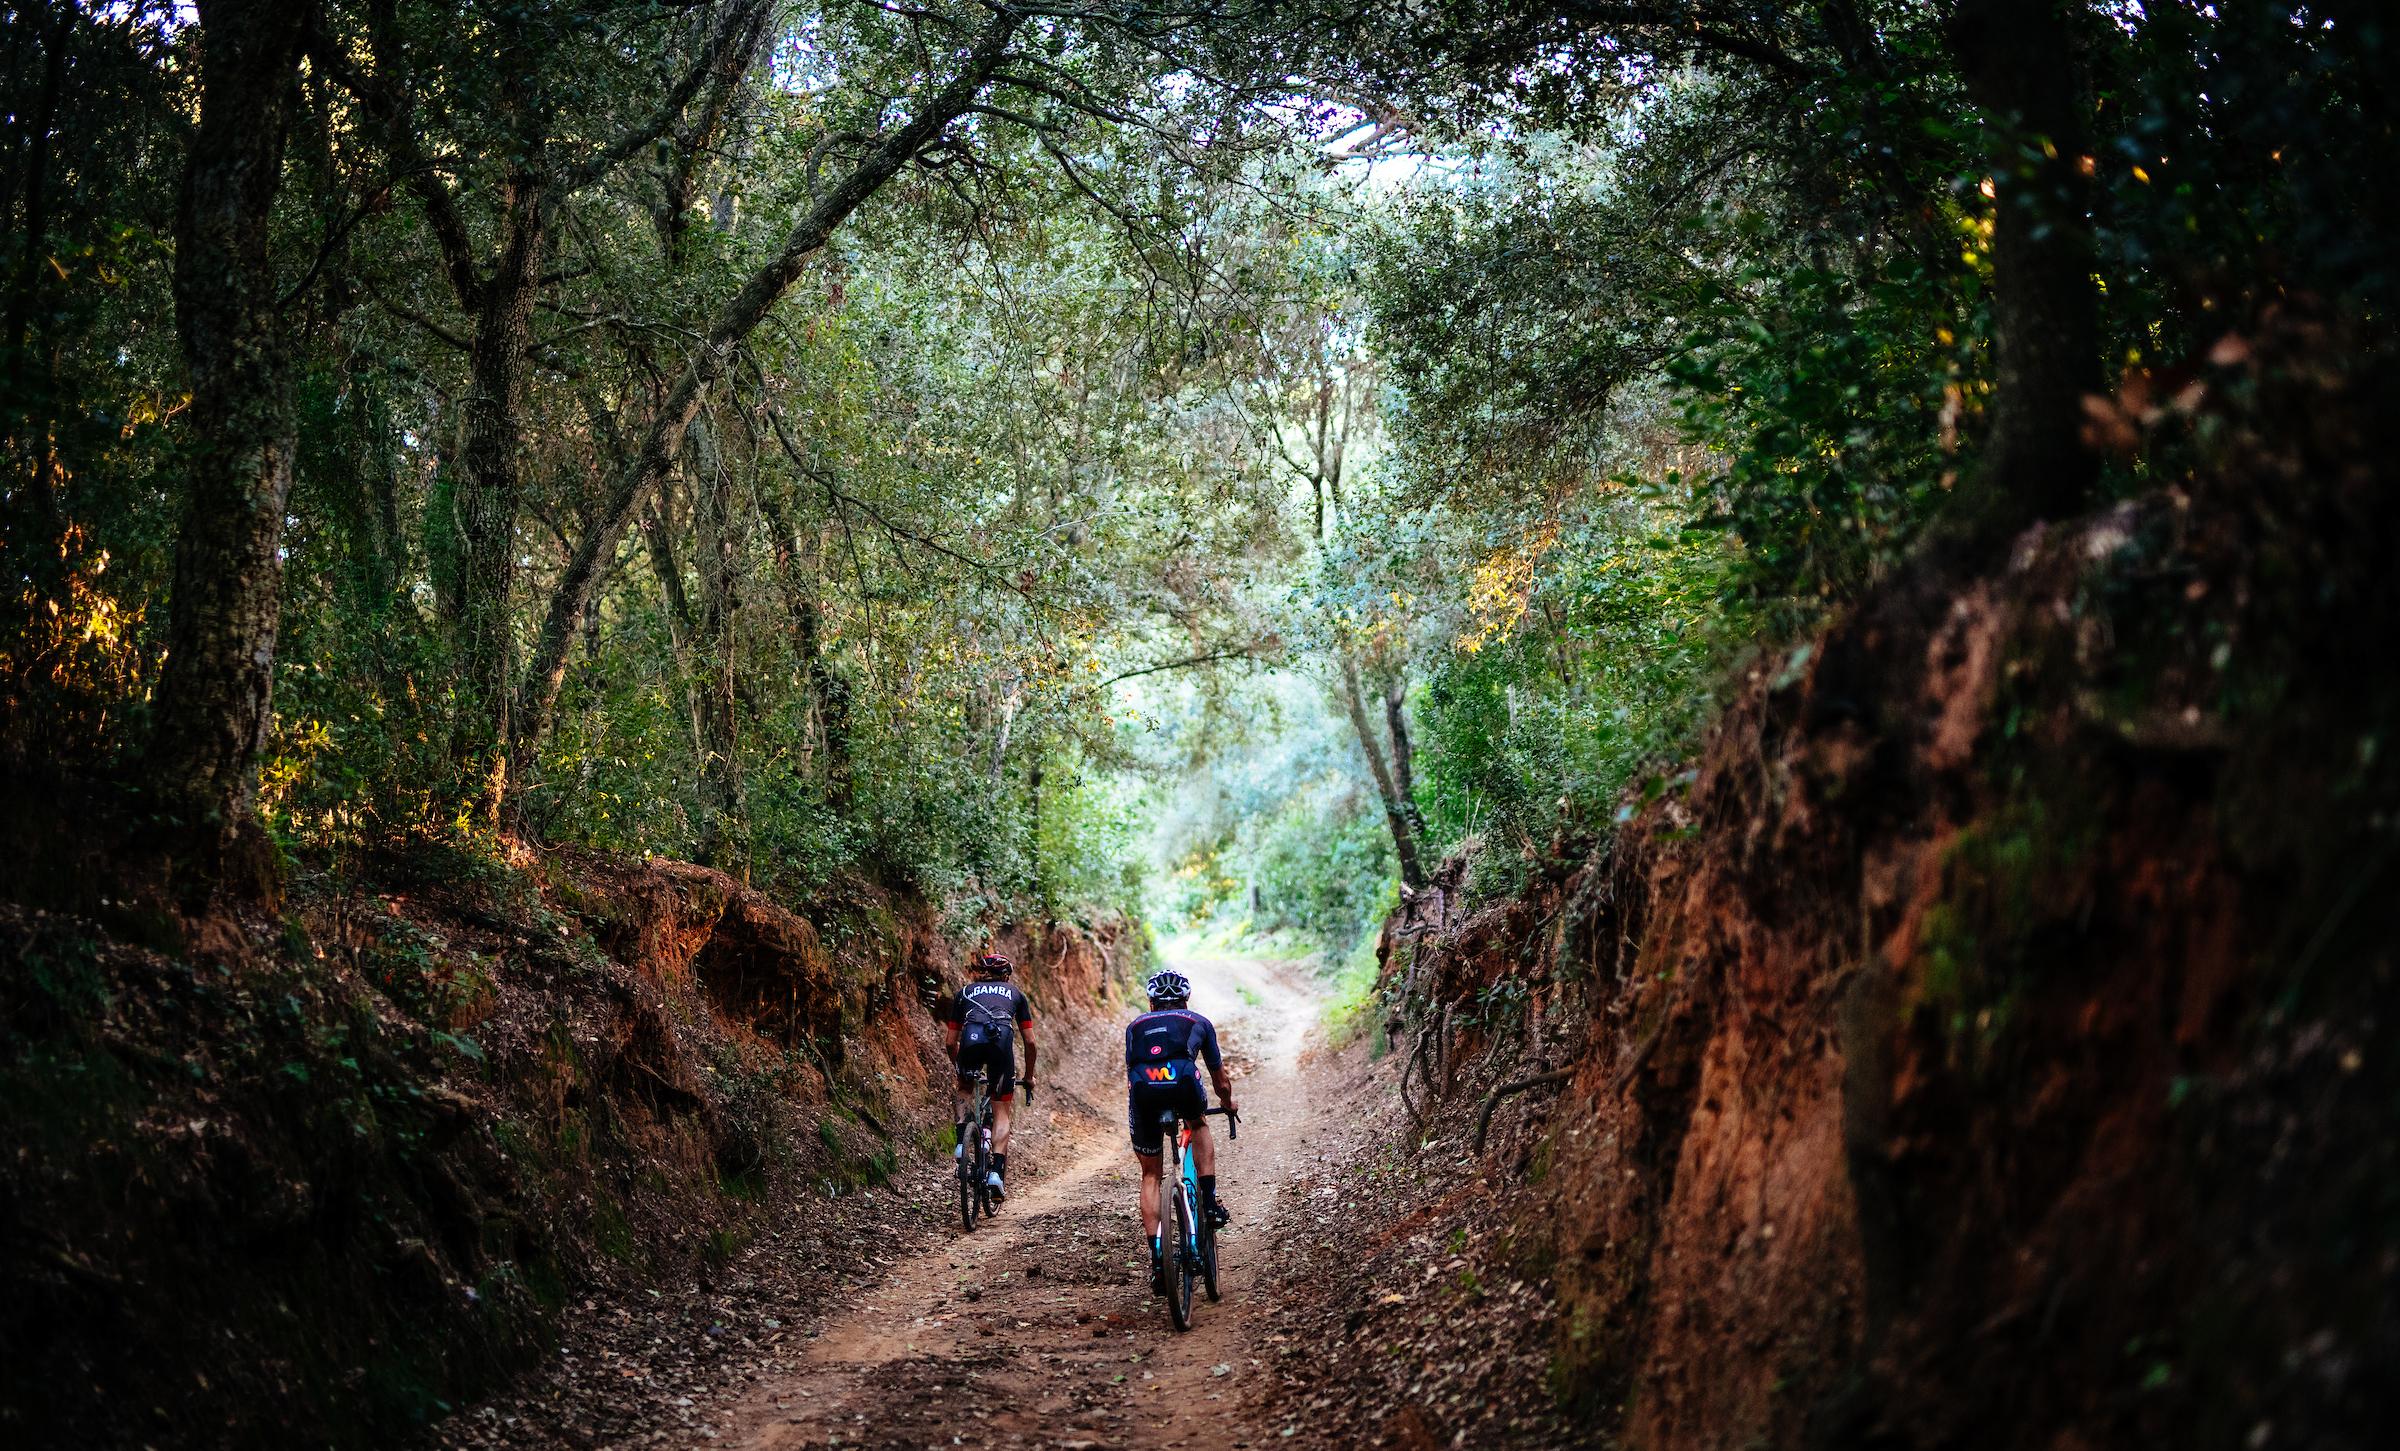 Pinarello Grevil gravel bike first impression review